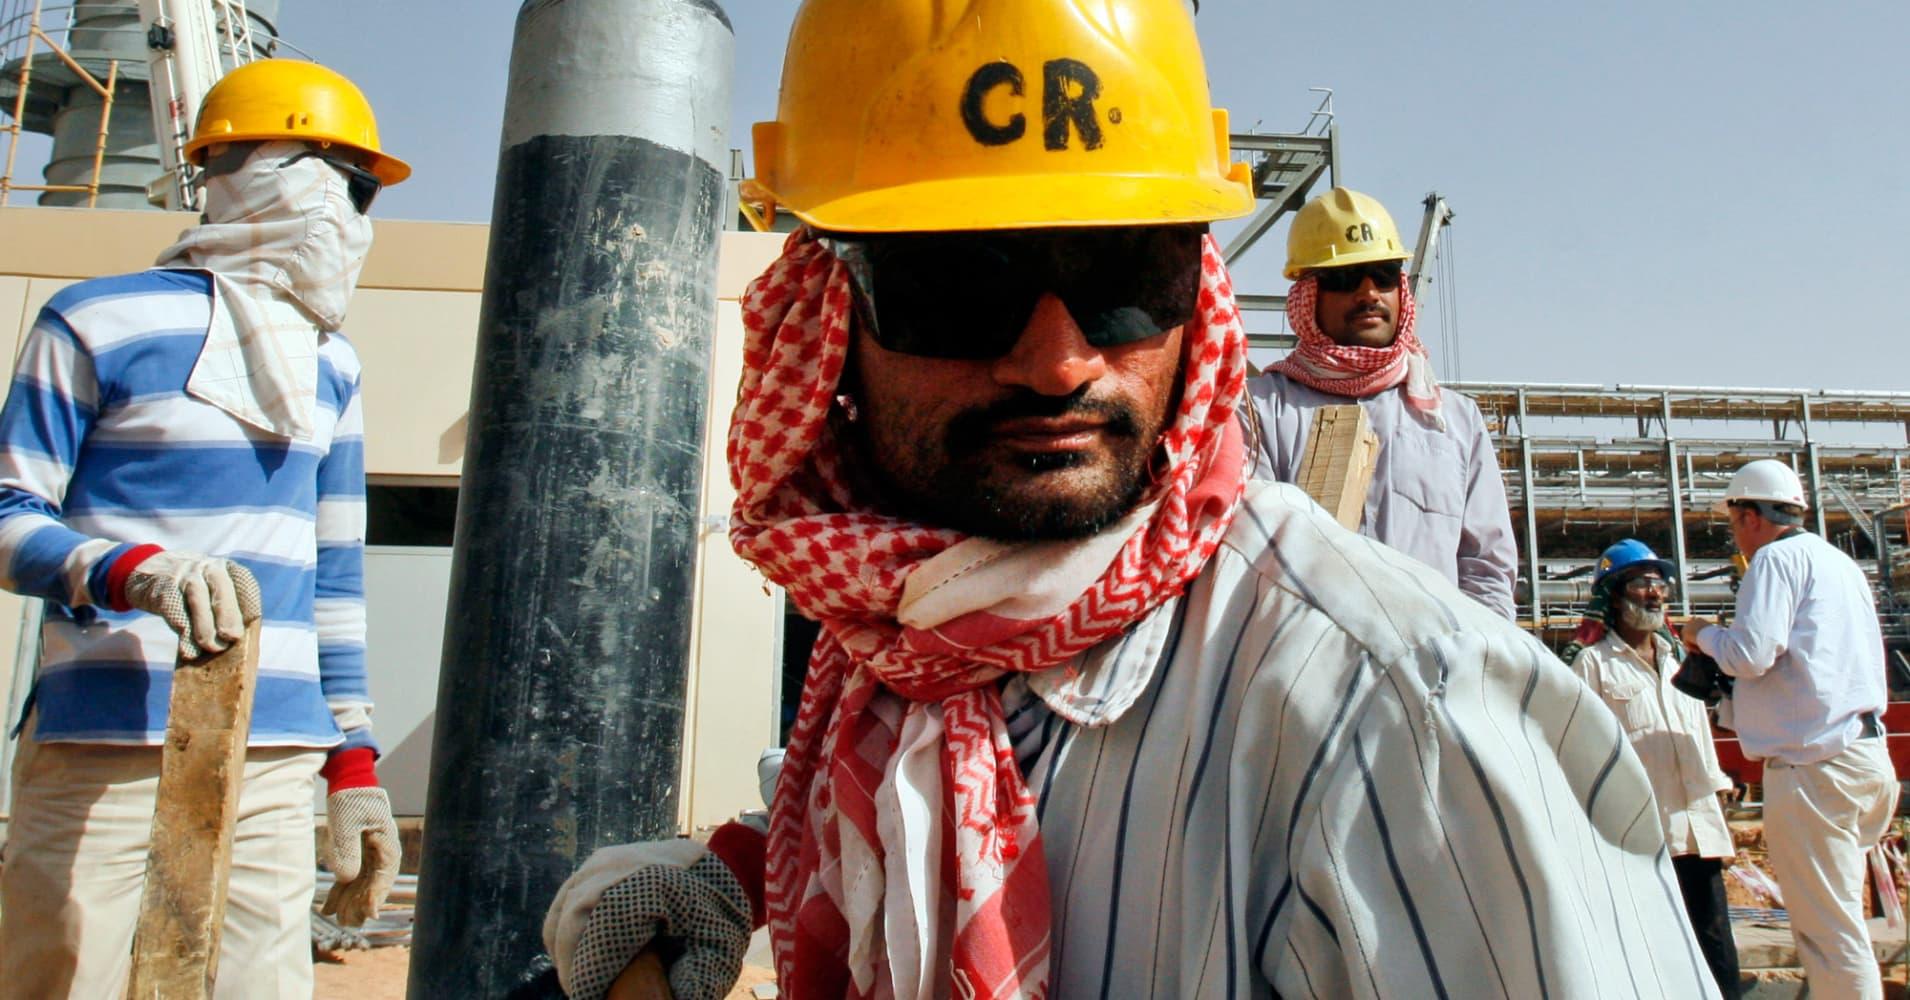 petroleum and saudi arabia Sinopec international petroleum service corporation sinopec service has covered its business in saudi arabia, sinopec service saudi arabia has been established.